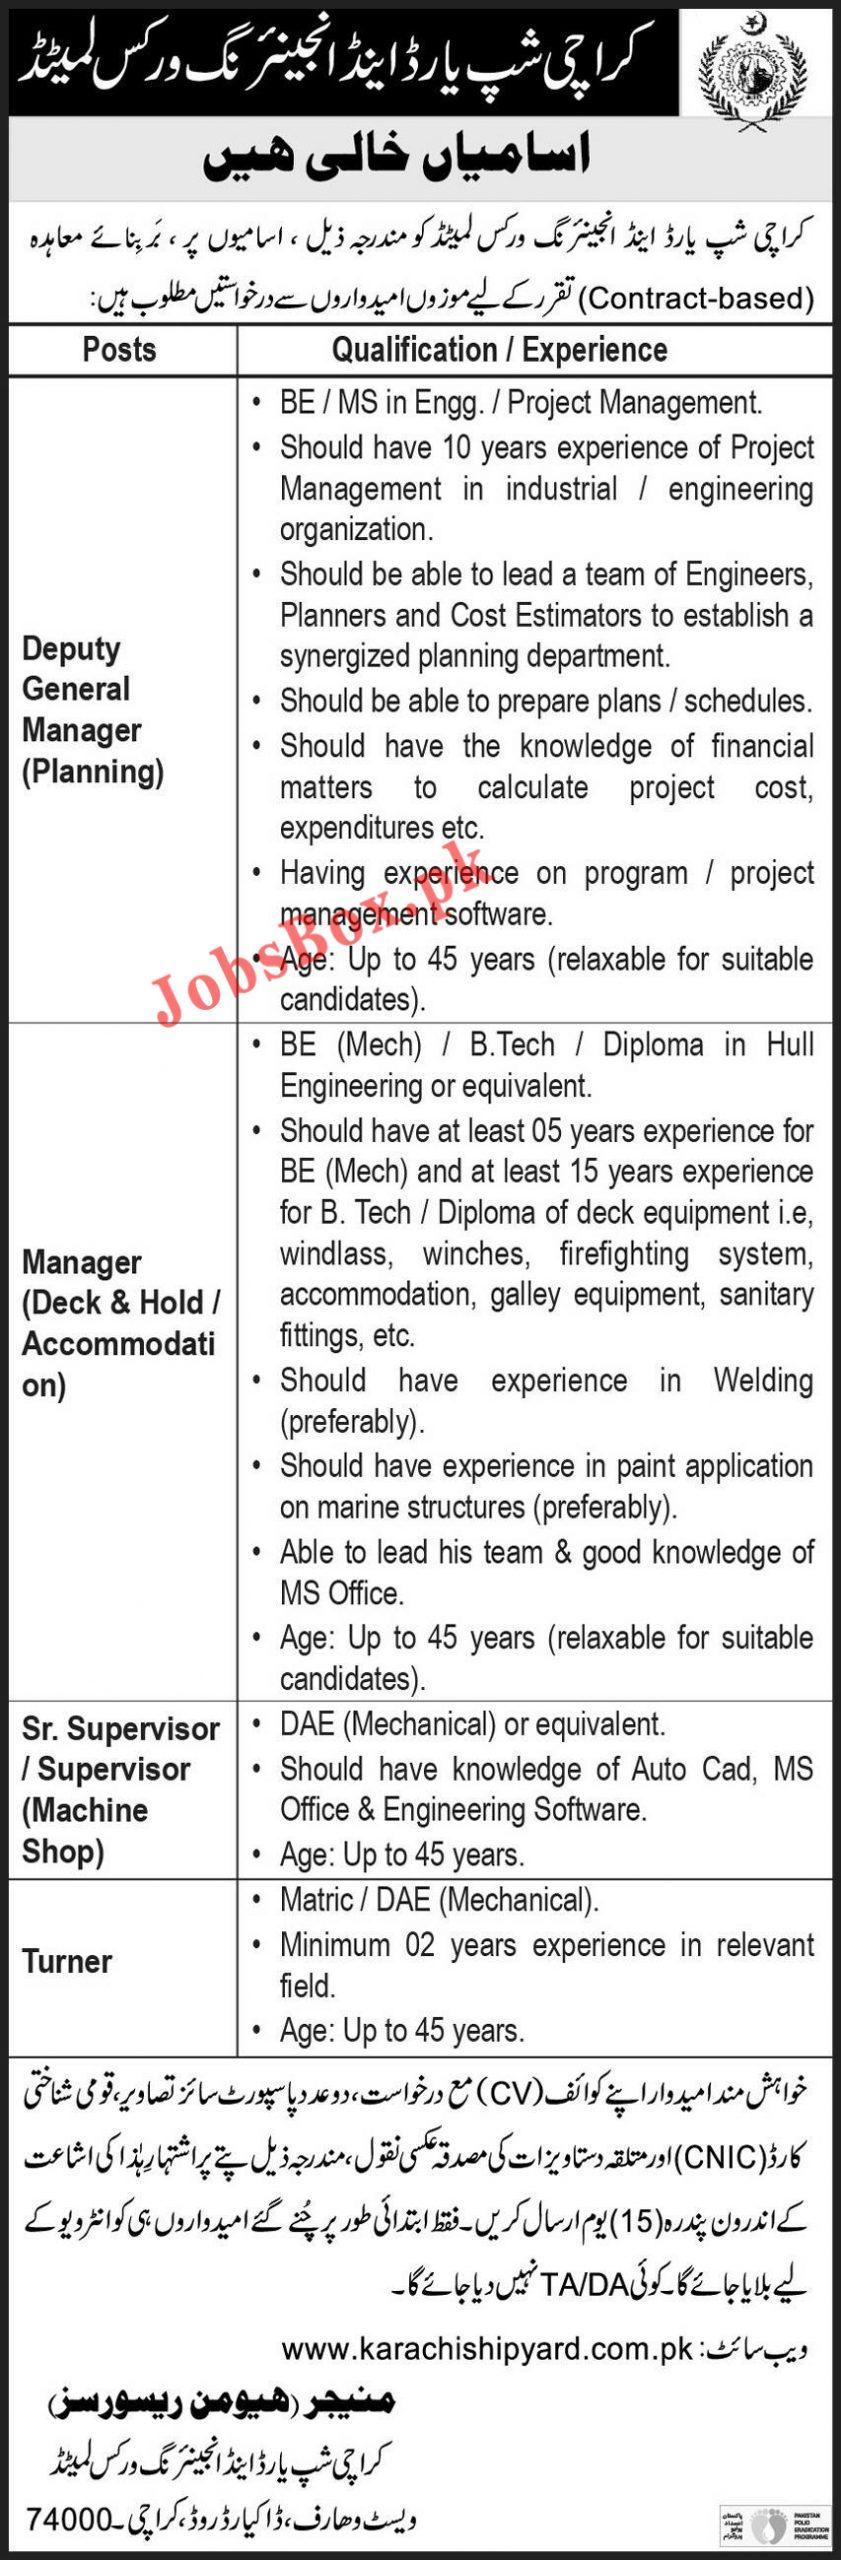 Karachi Shipyard and Engineering Works KSEW Jobs 2021 Latest